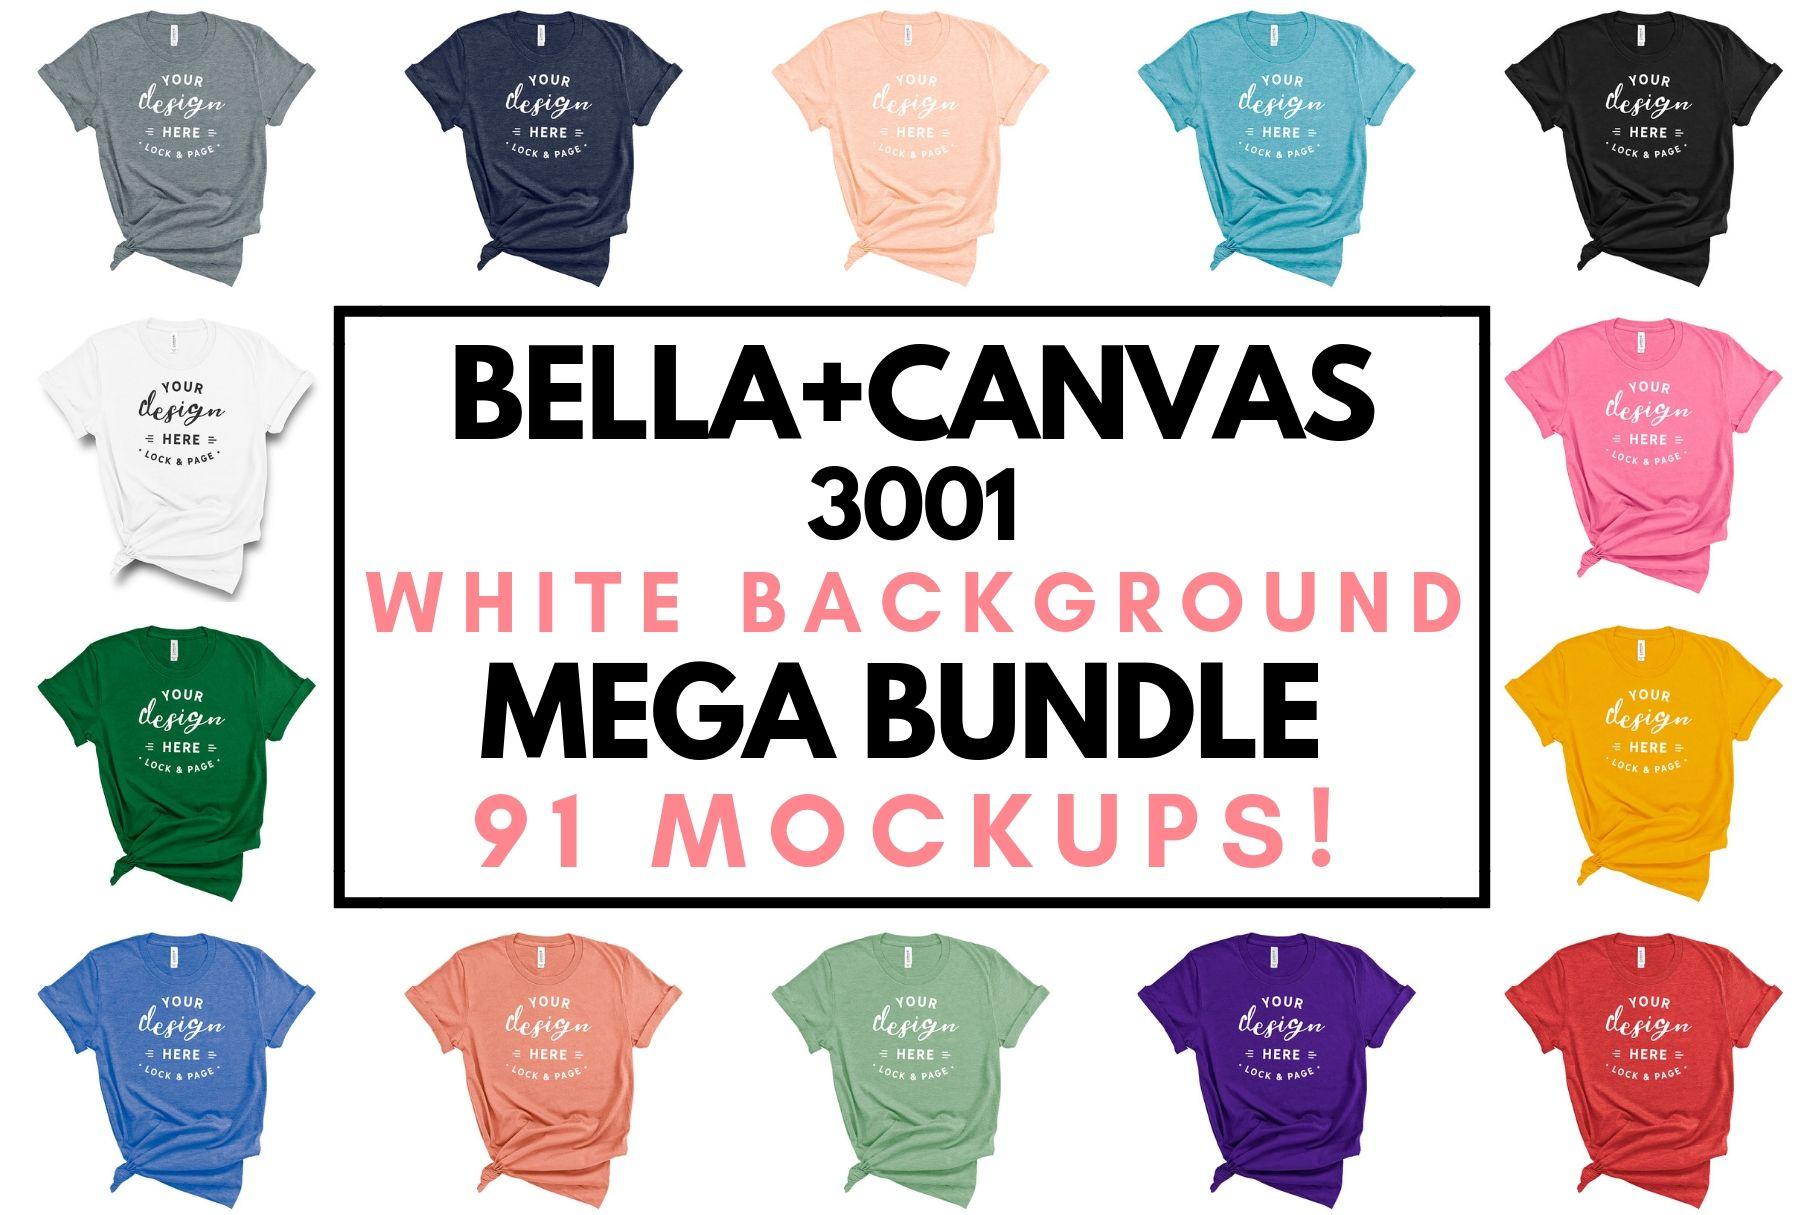 Download Bella Canvas 3001 T Shirt Mockup Bundle All Colors On White Example Image 1 Design Mockup Free Tshirt Mockup Shirt Mockup